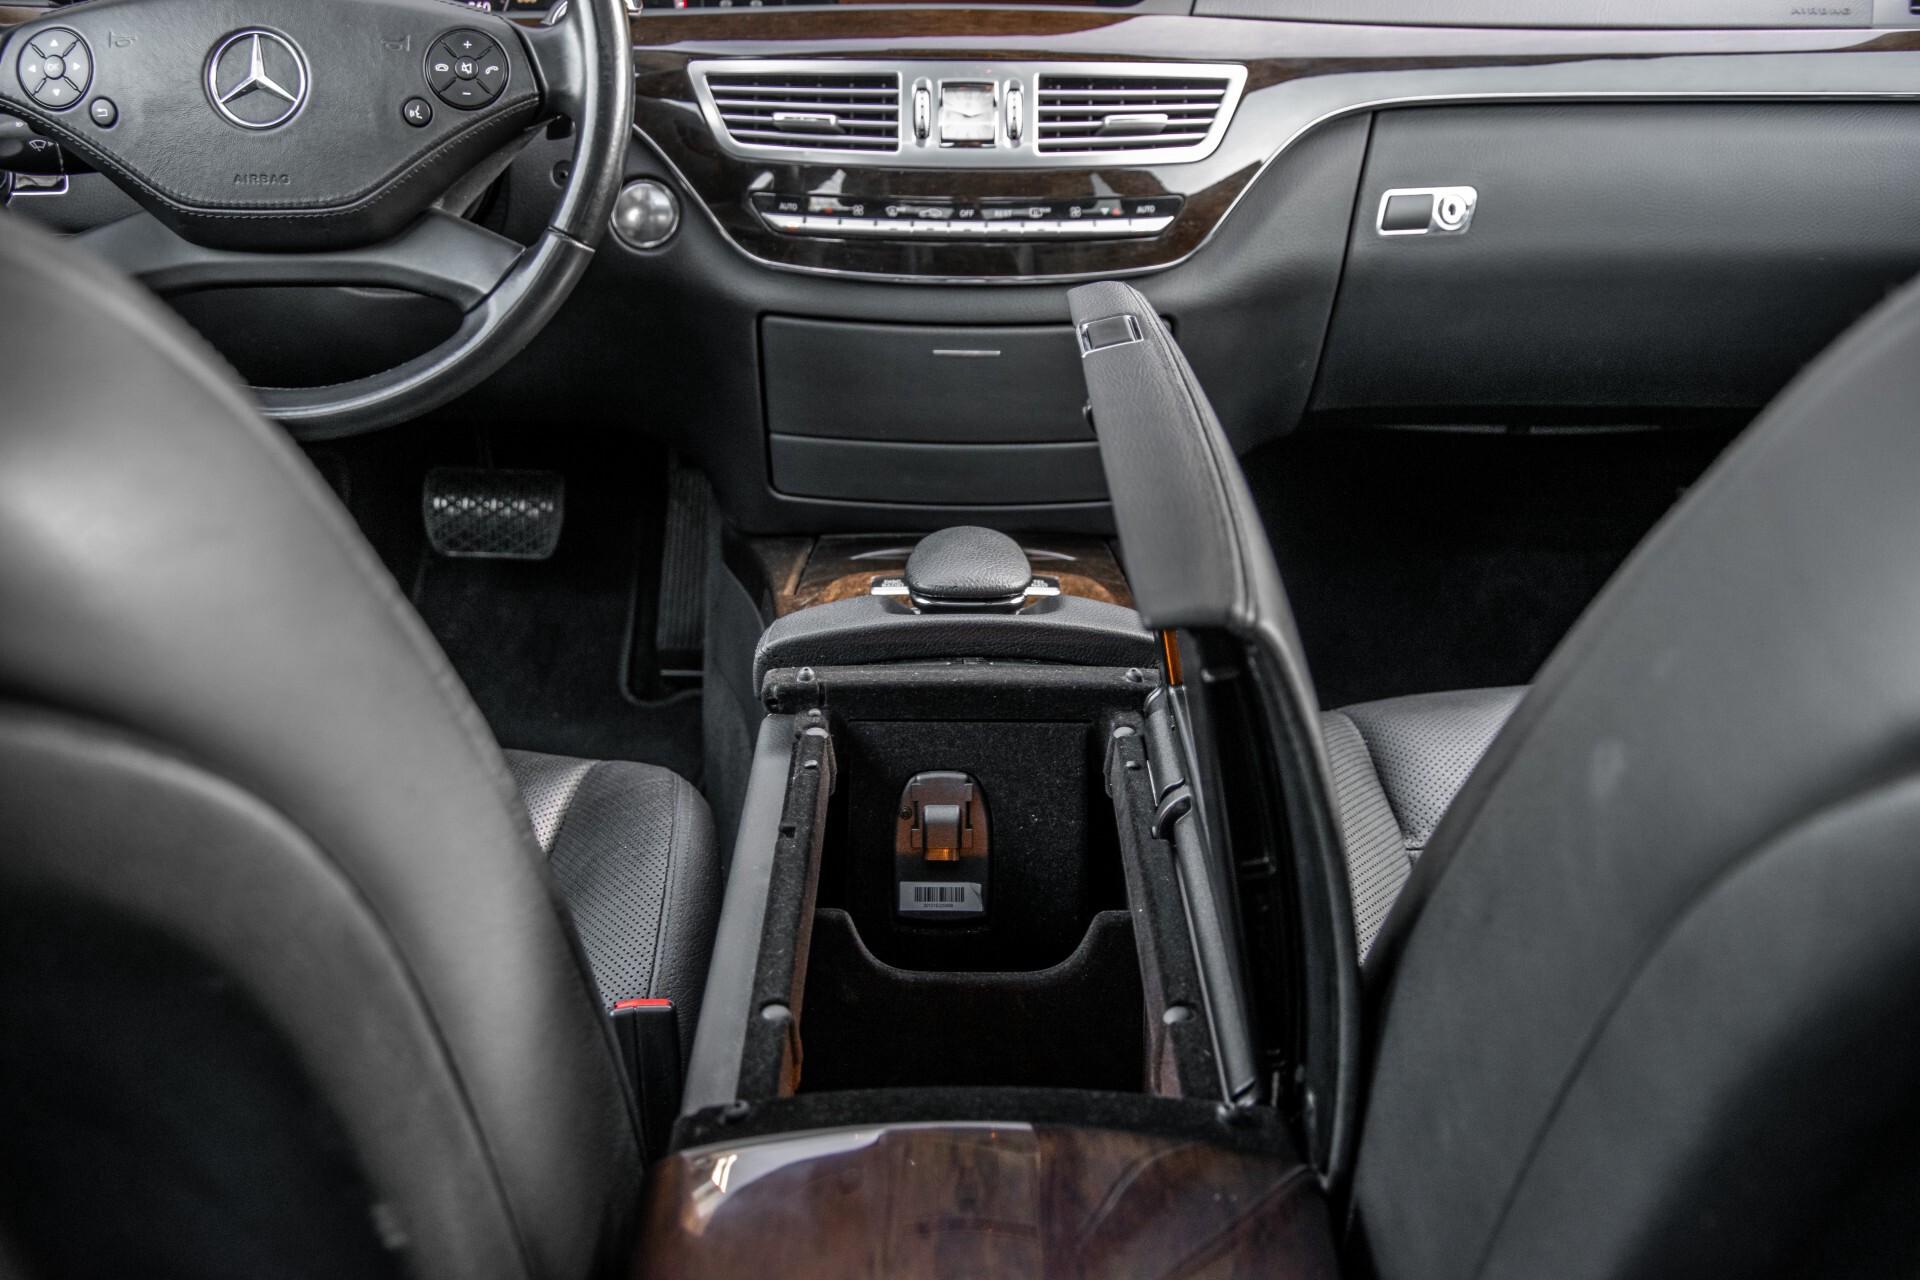 Mercedes-Benz S-Klasse 350 Bluetec Keyless/Distronic/Nightvision/Schuifdak/Harman-Kardon Aut7 Foto 59